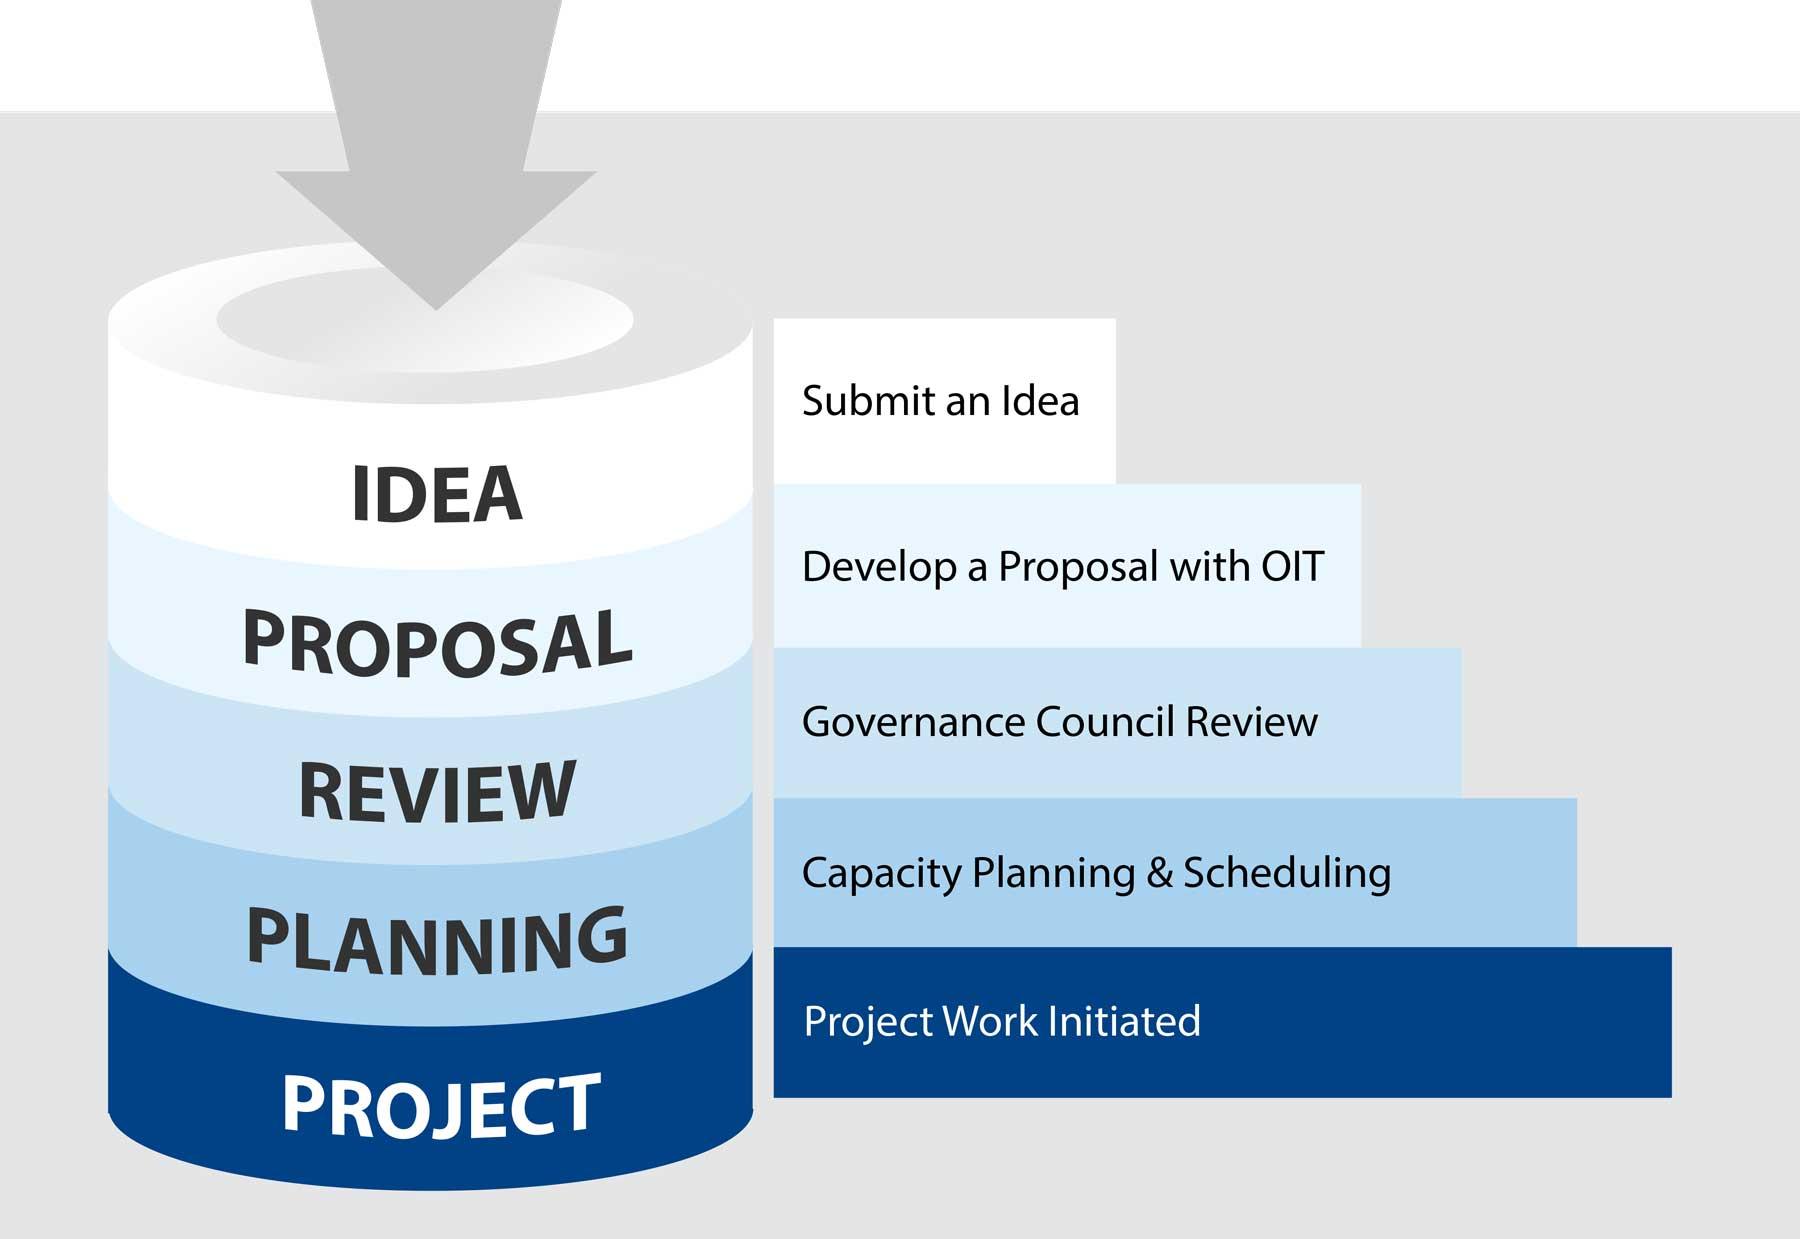 SMU's IT Project Management Workflow